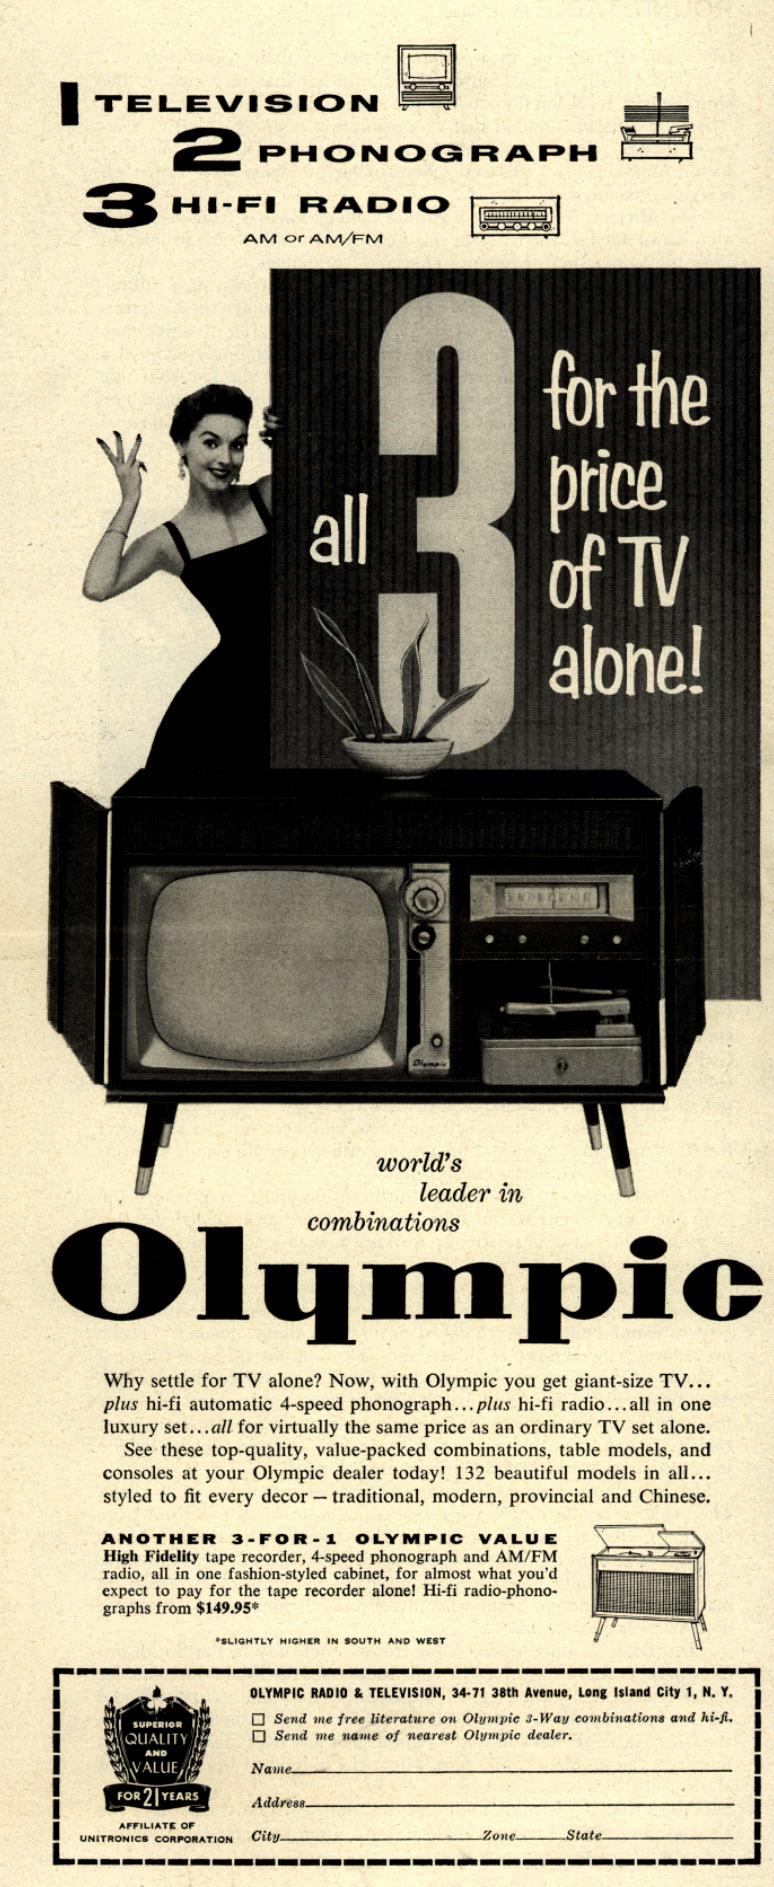 1_Television_2_Phonograph_3_Hi-Fi_Radio